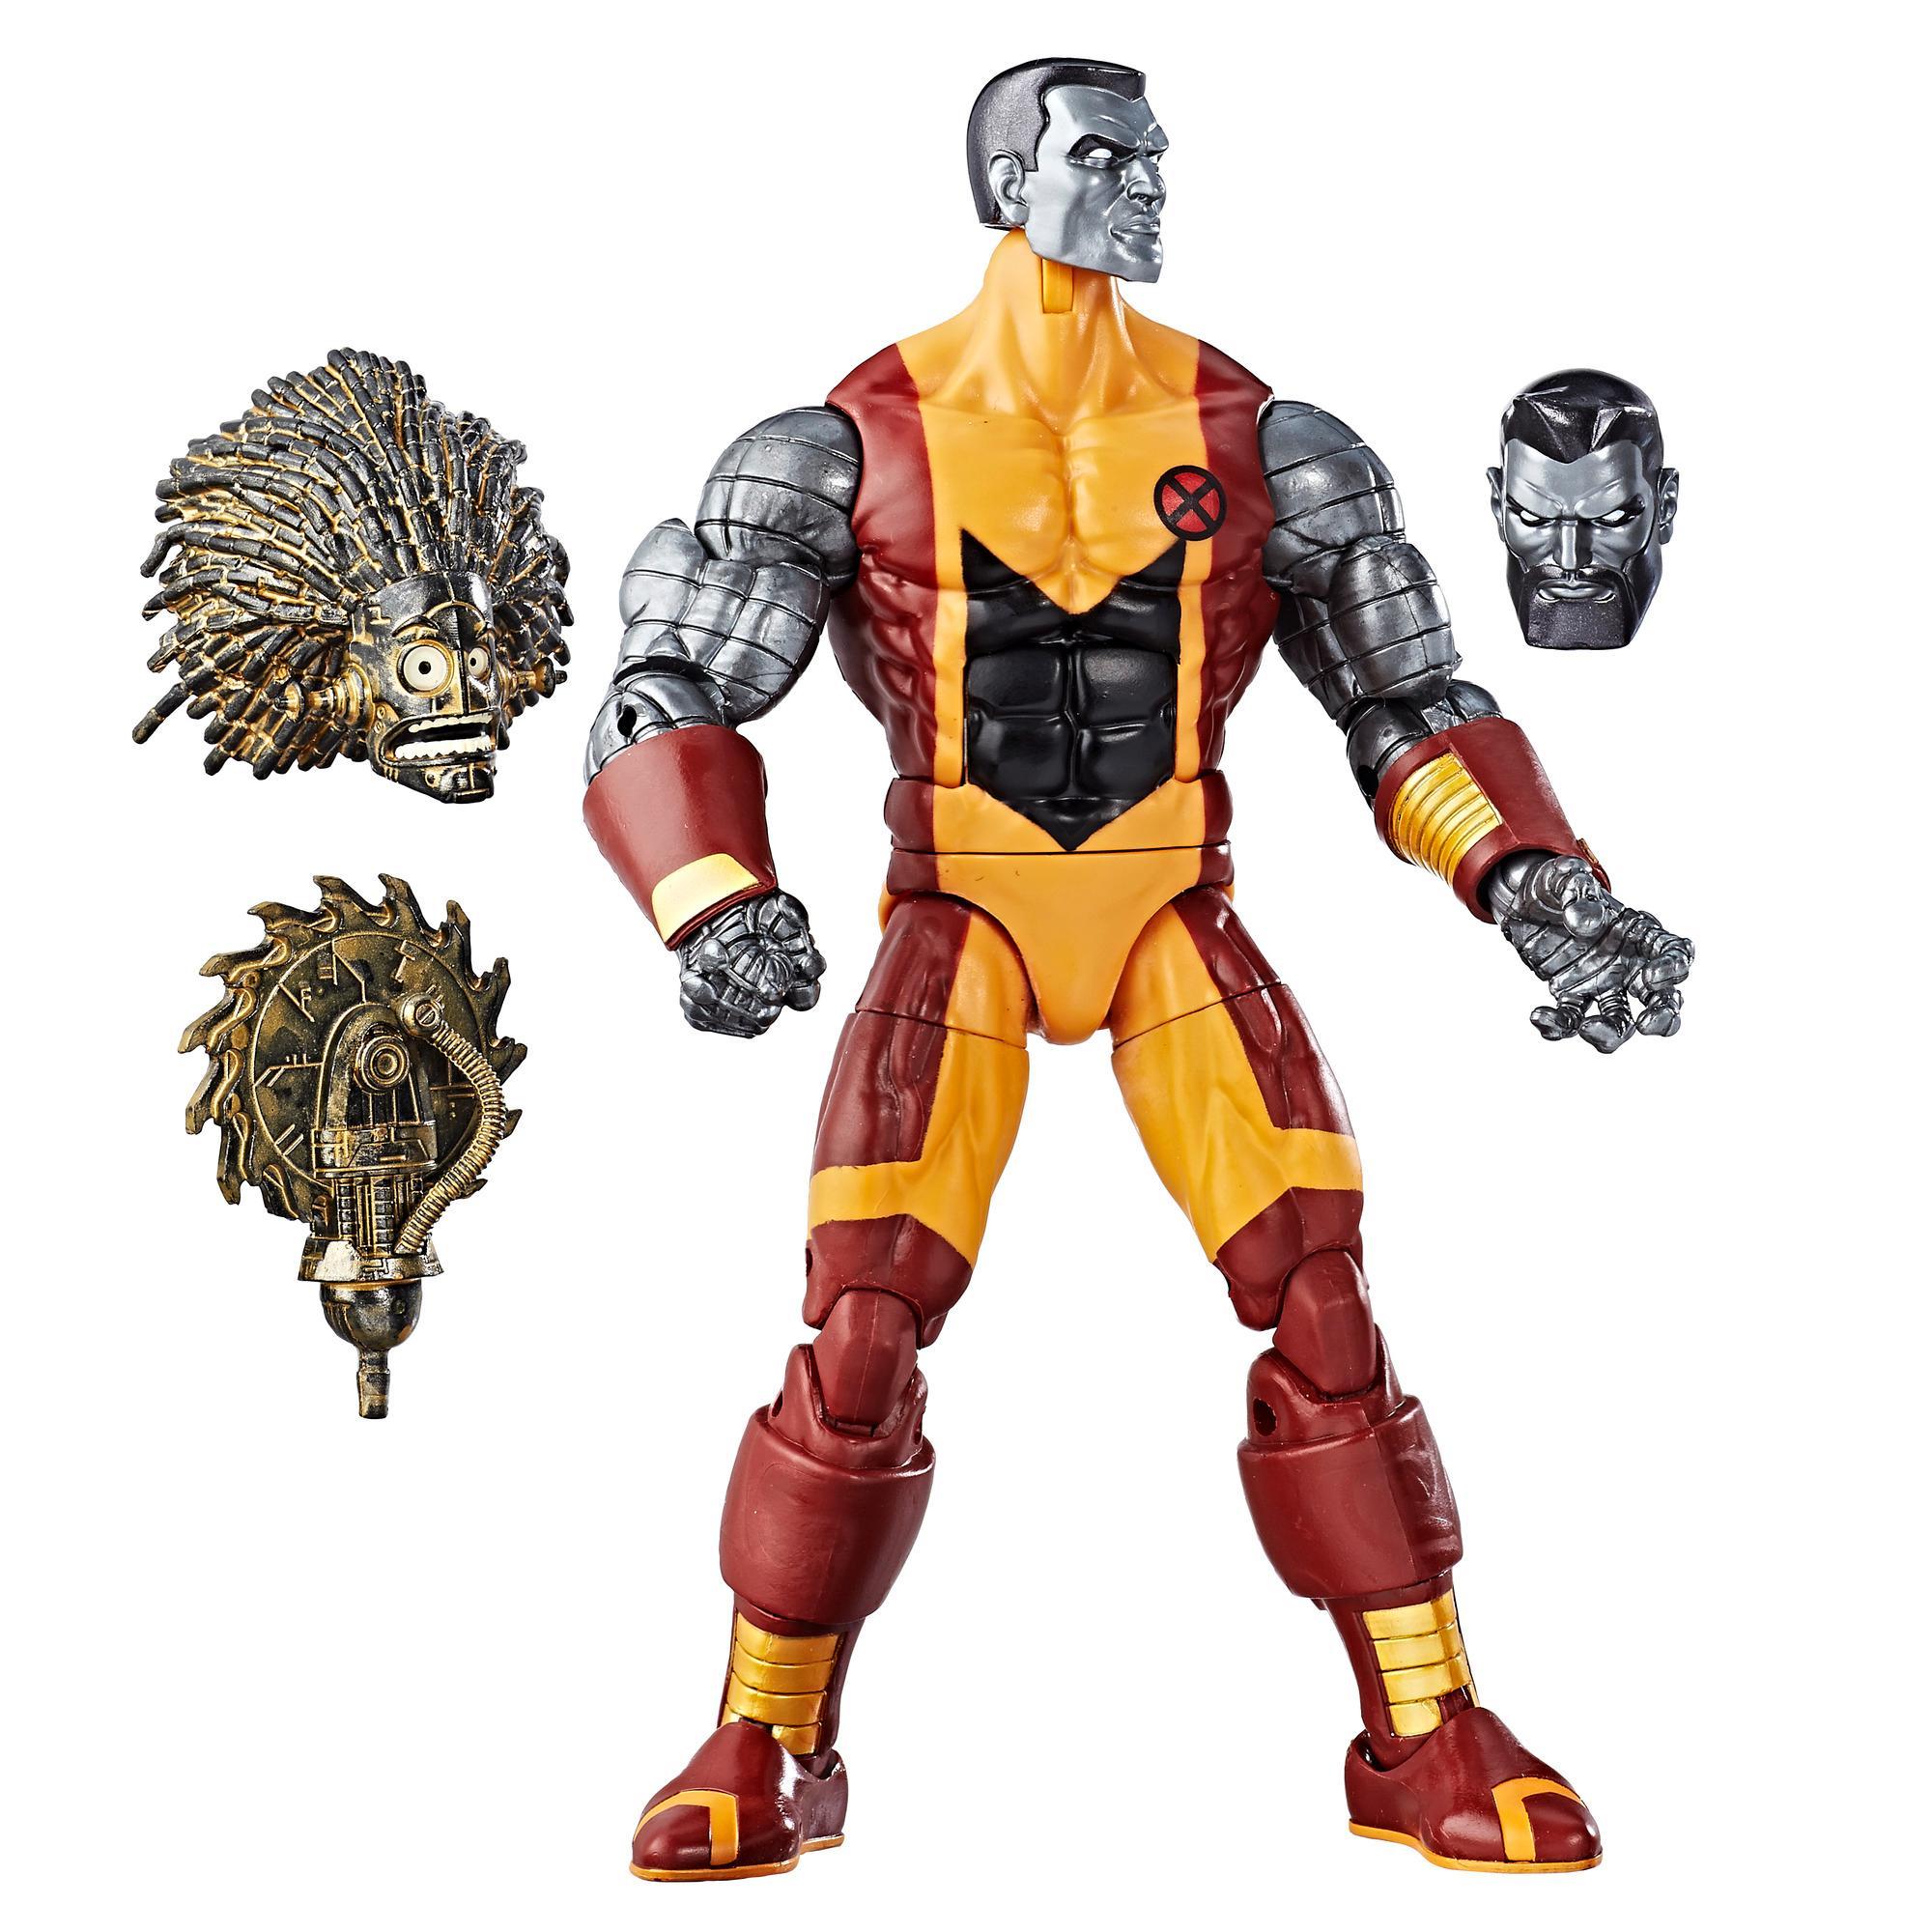 Marvel X-Men 6-Inch Legends Series Marvel's Colossus